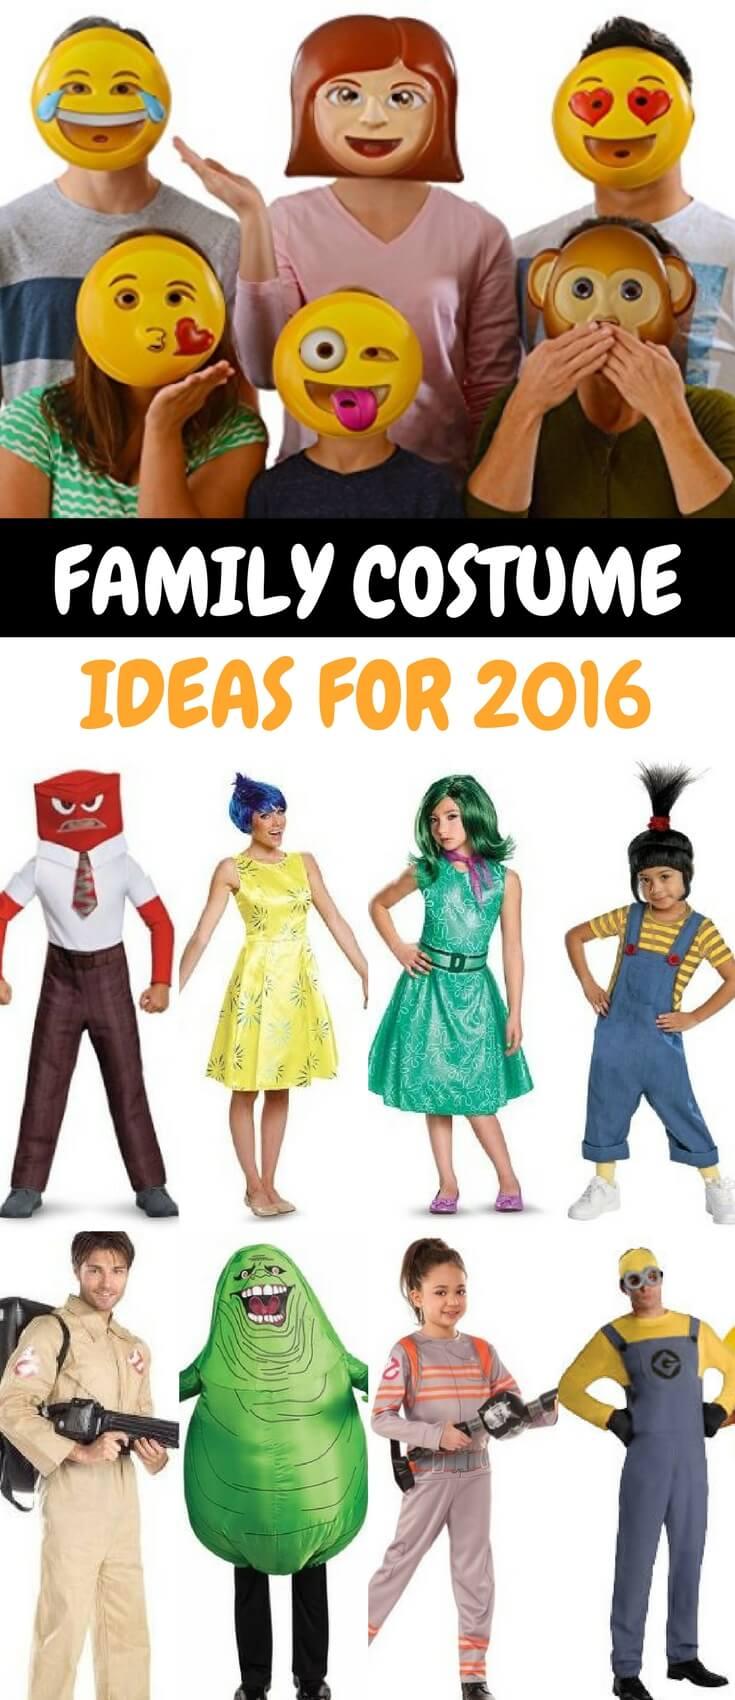 Family Costume Ideas 2016